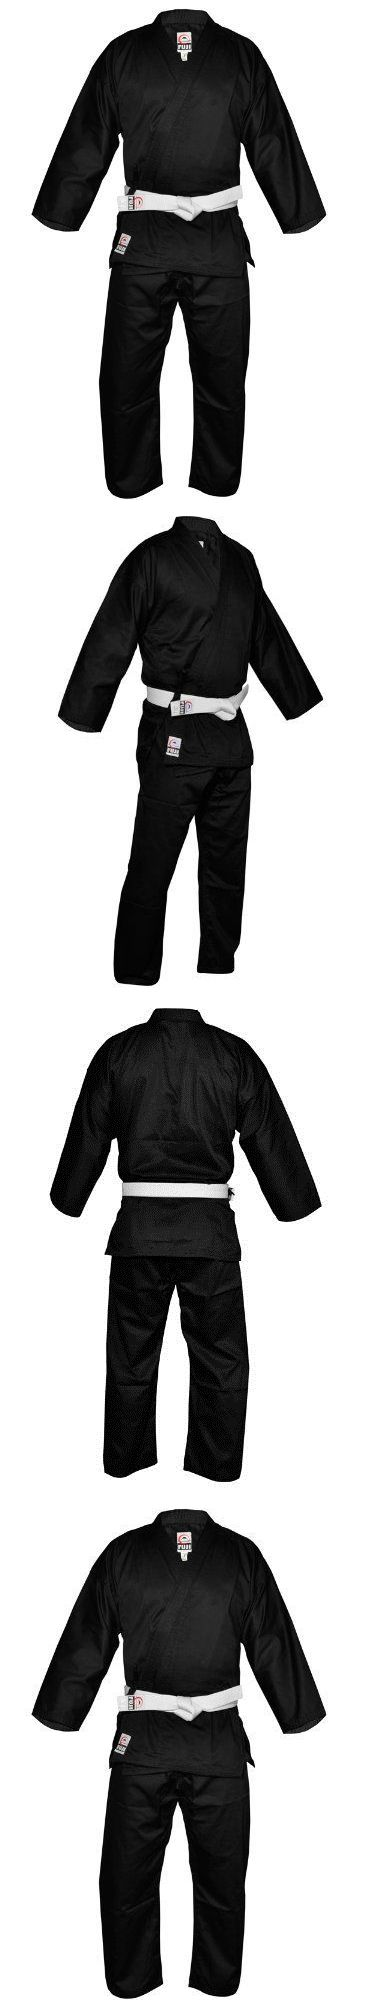 Jackets 179771: Fuji Karate Uniform Black 2 Mens Martial Arts Uniform Jacket, New -> BUY IT NOW ONLY: $47.92 on eBay!